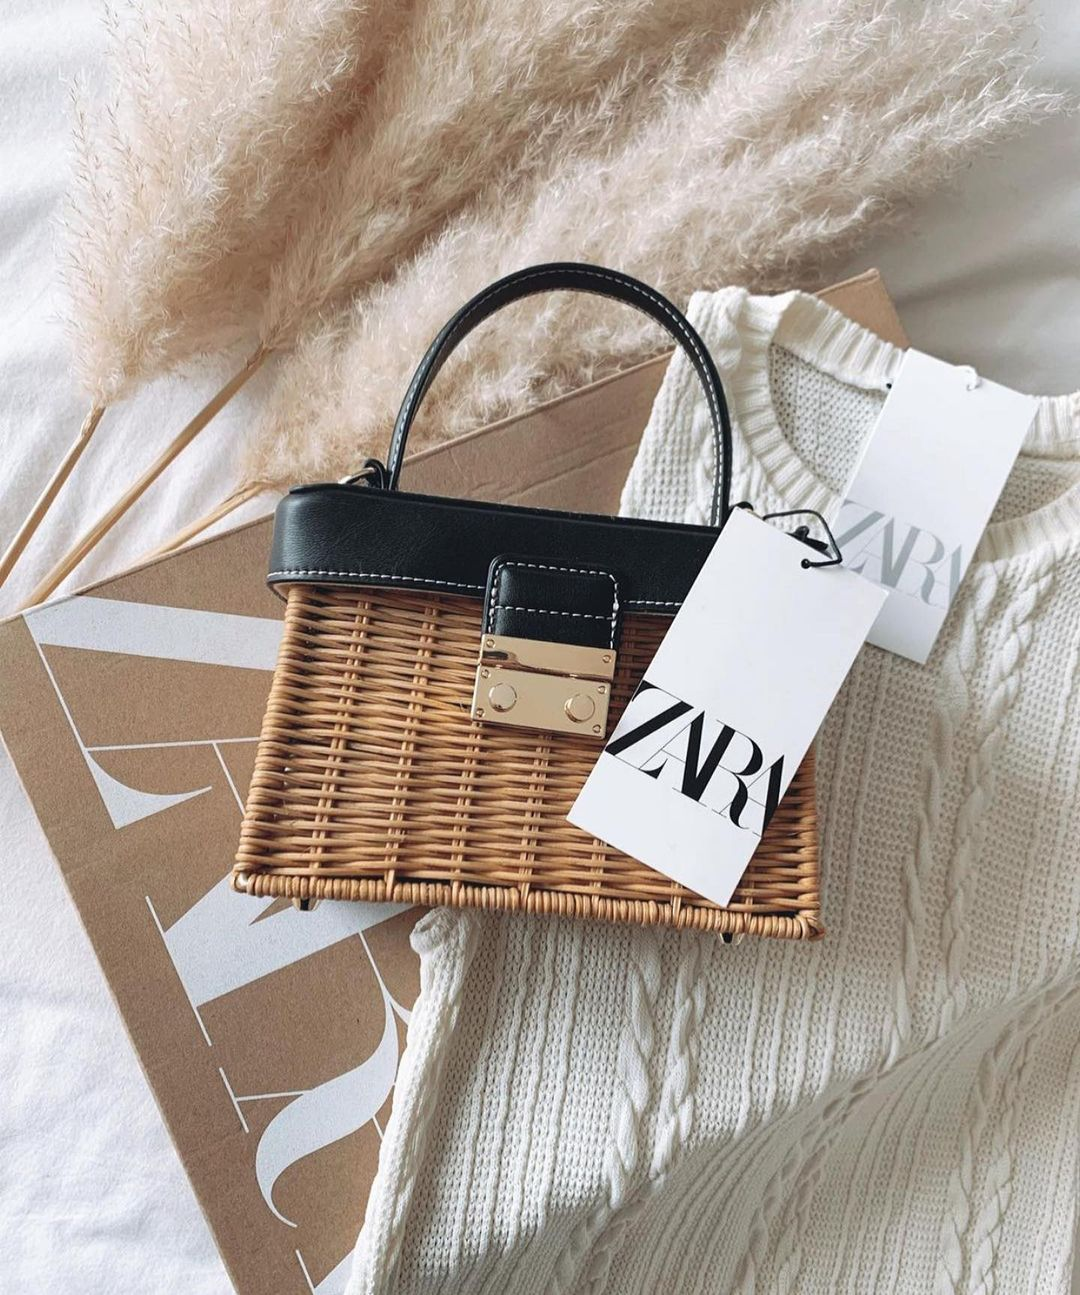 rigid rattan handle bag de Zara sur zaraaddiction